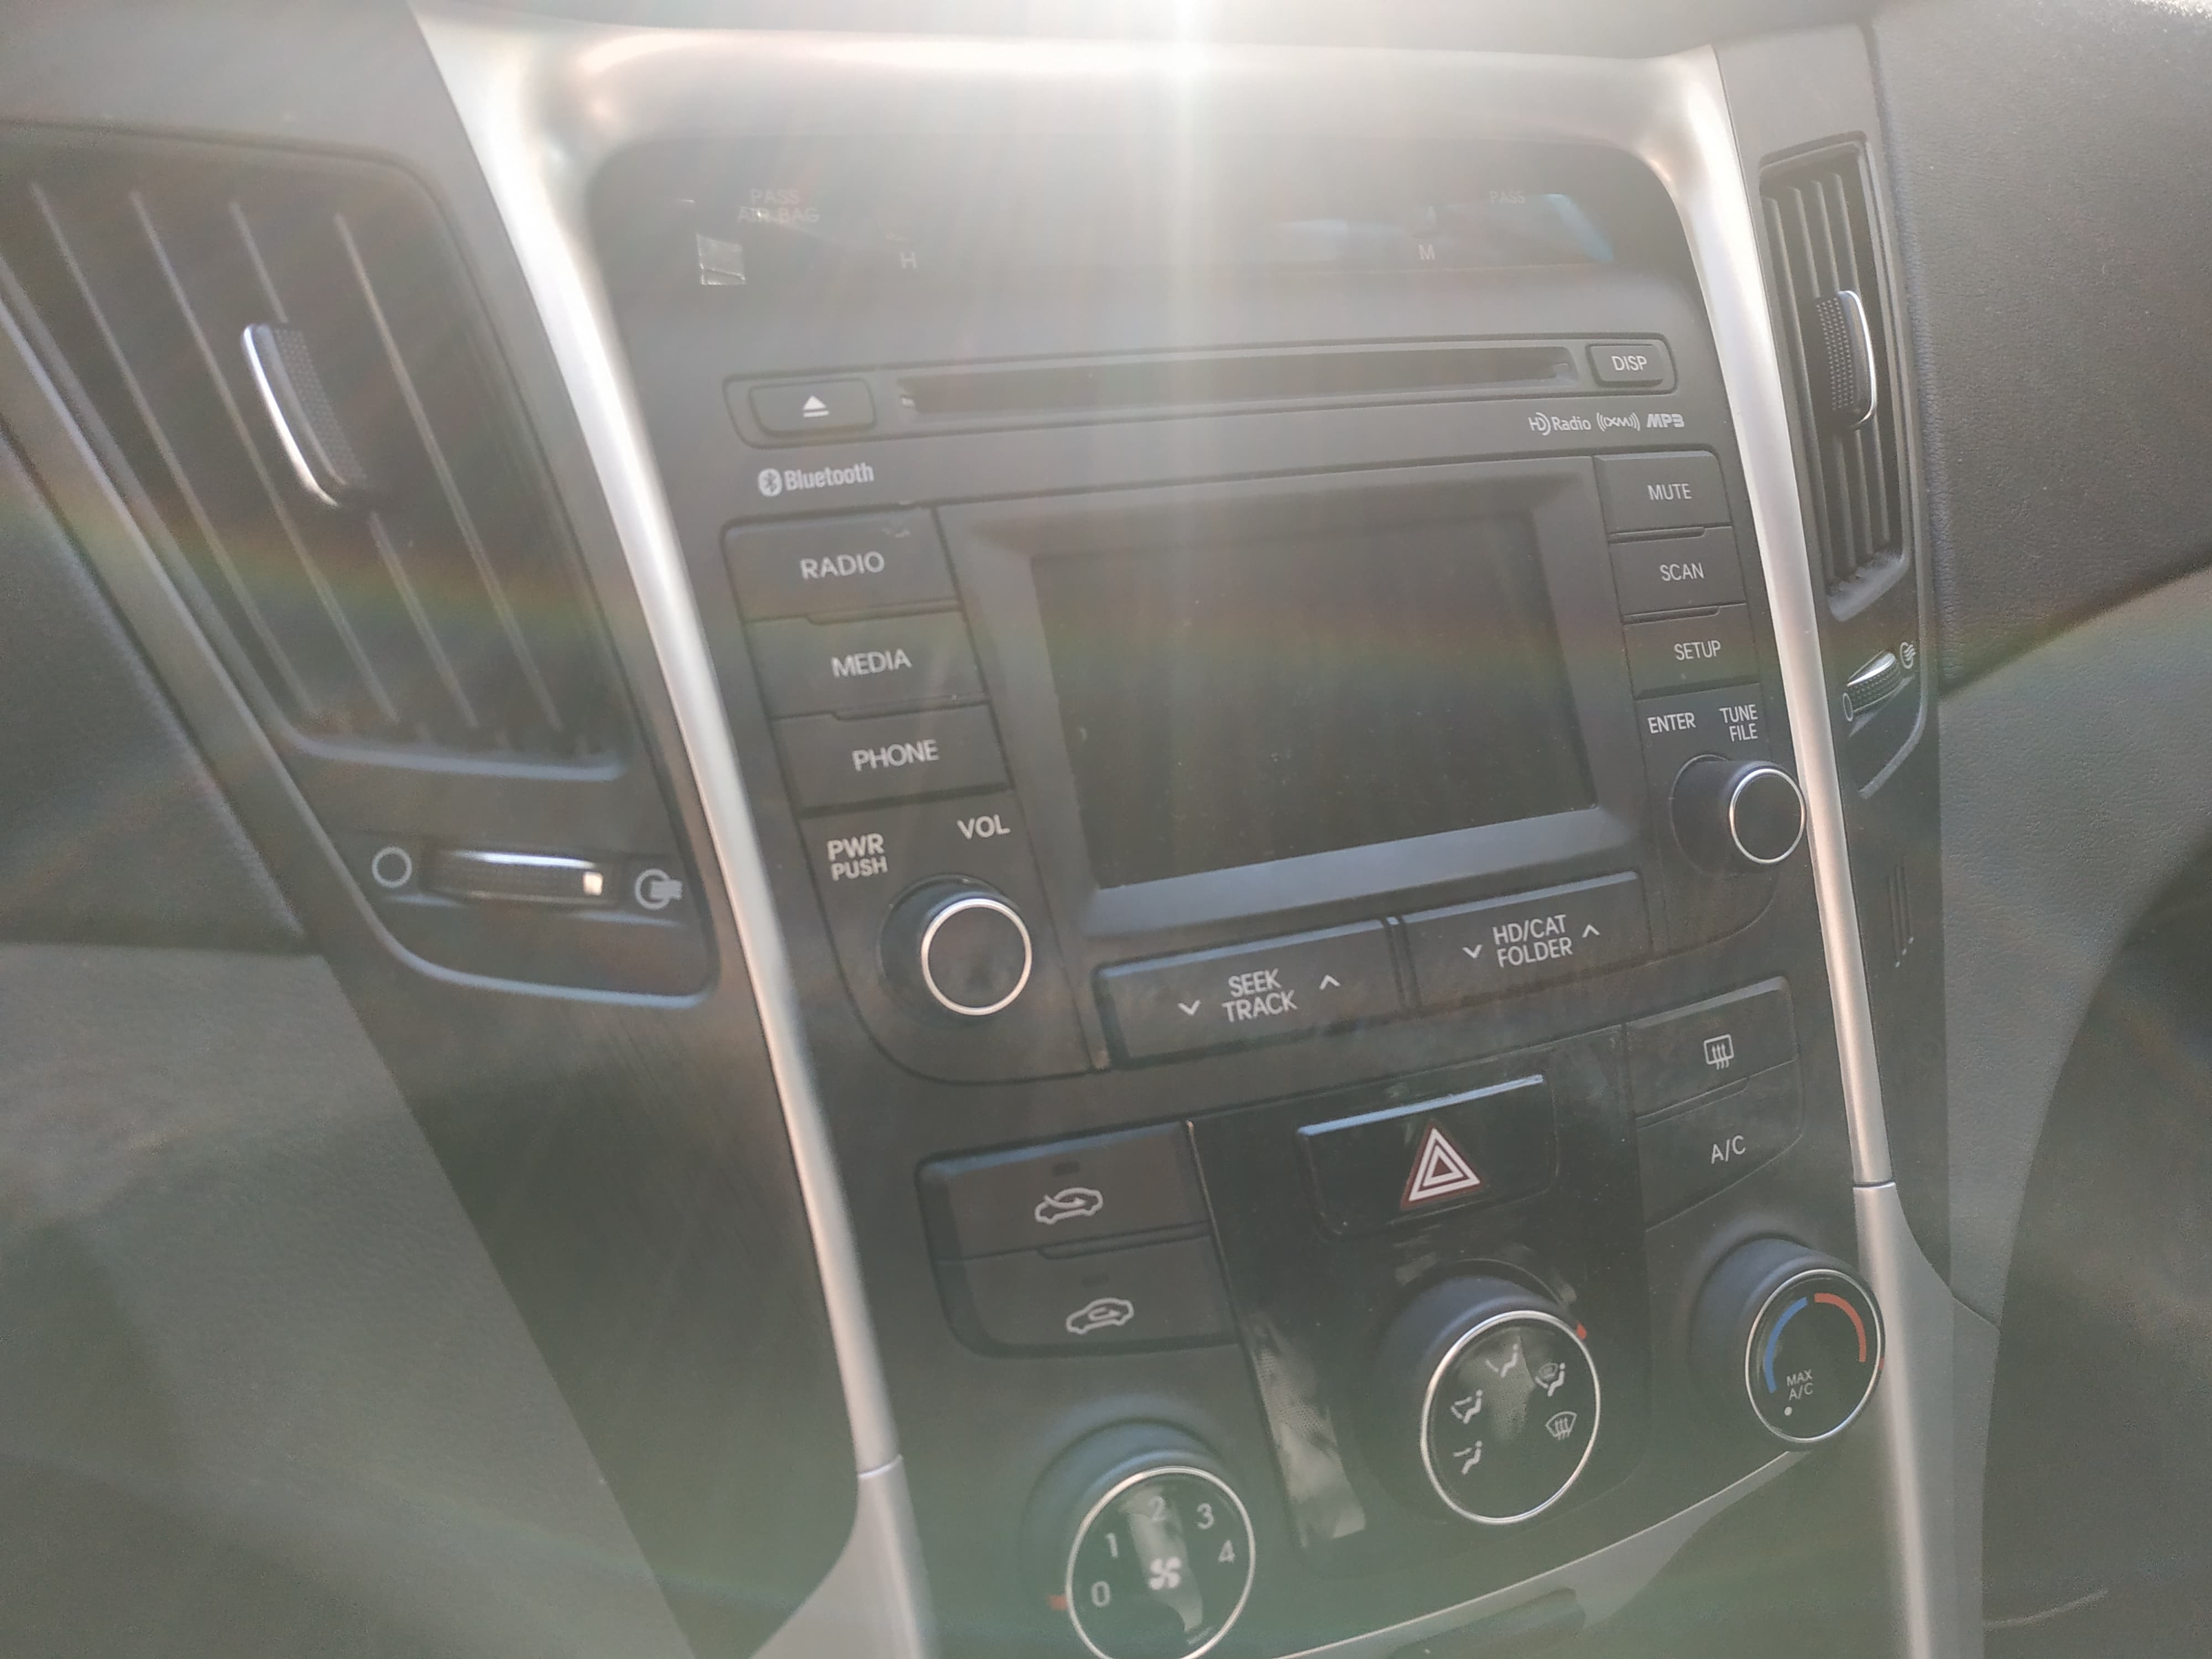 Hyundai Sonata 2.4(lt) 2014 Подержанный  $6200